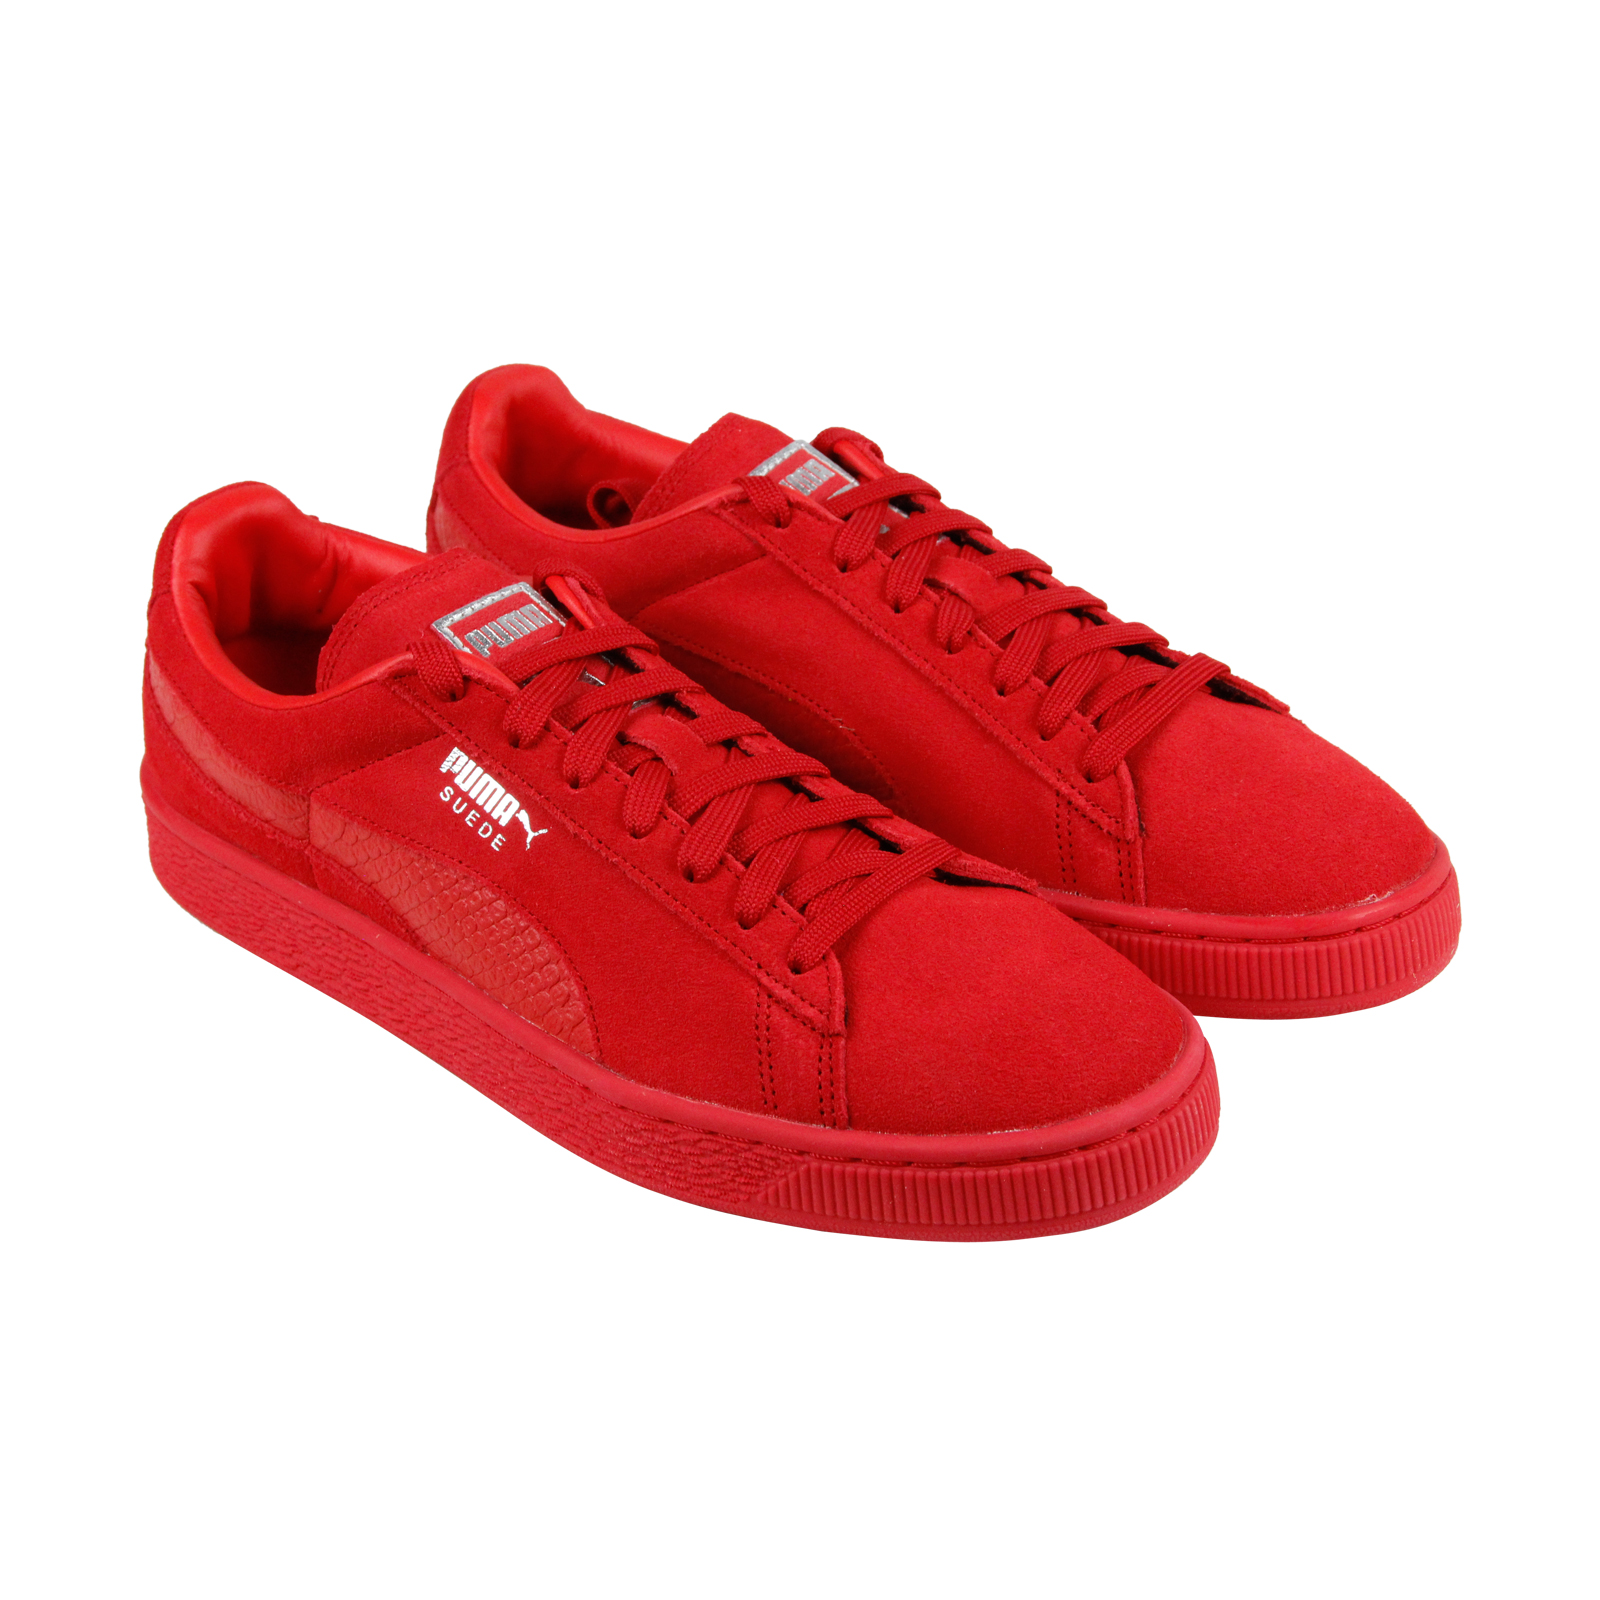 Scarpe casual da uomo Puma Classic Mono Reptile uomos Red Suede Lace Up Sneakers Shoes